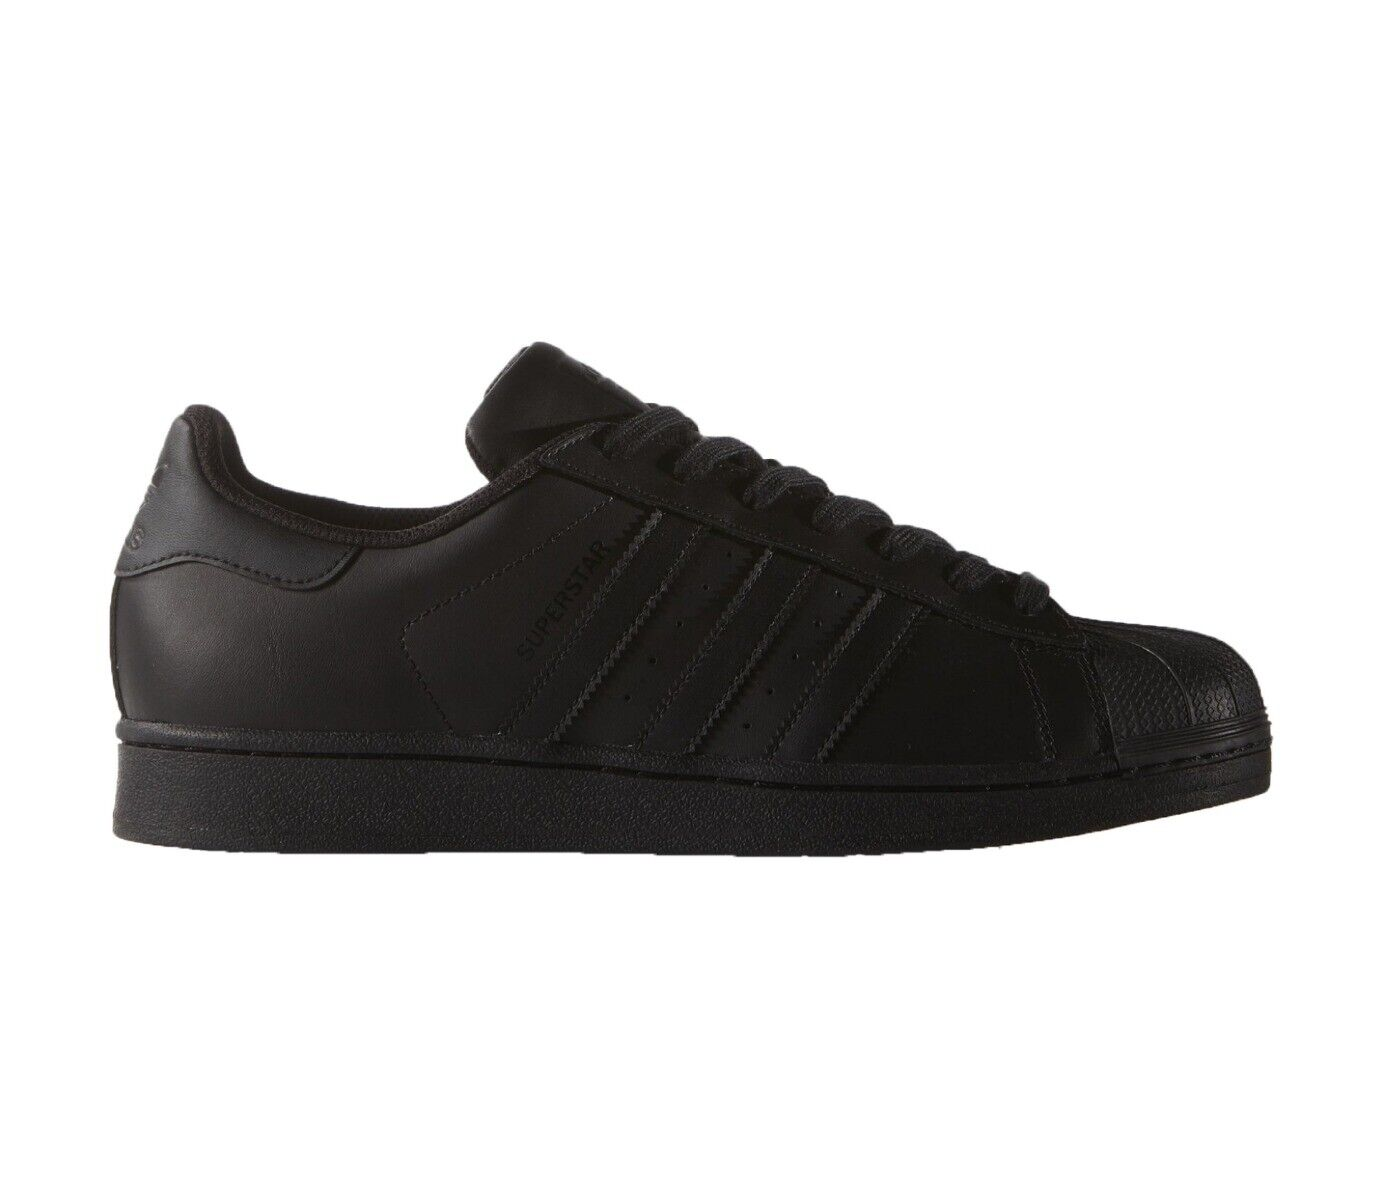 Adidas superstar negro men zapatos number 7-13 new